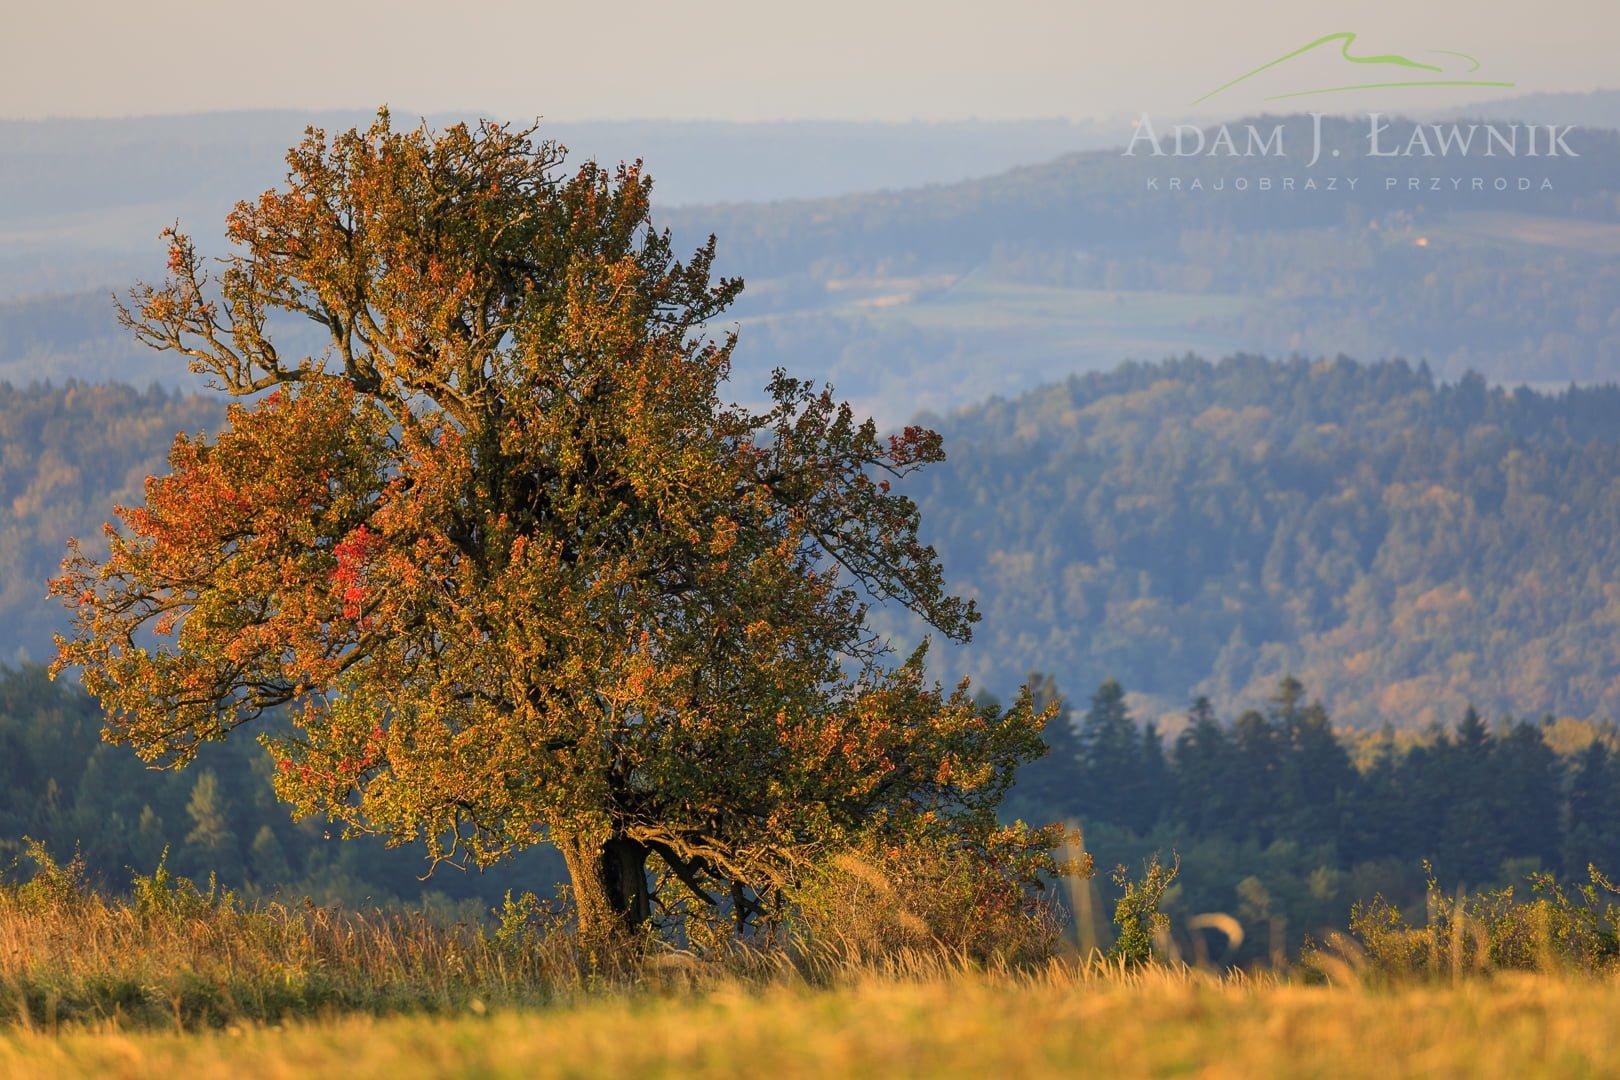 Turnica National Park, Poland 1709-00922C